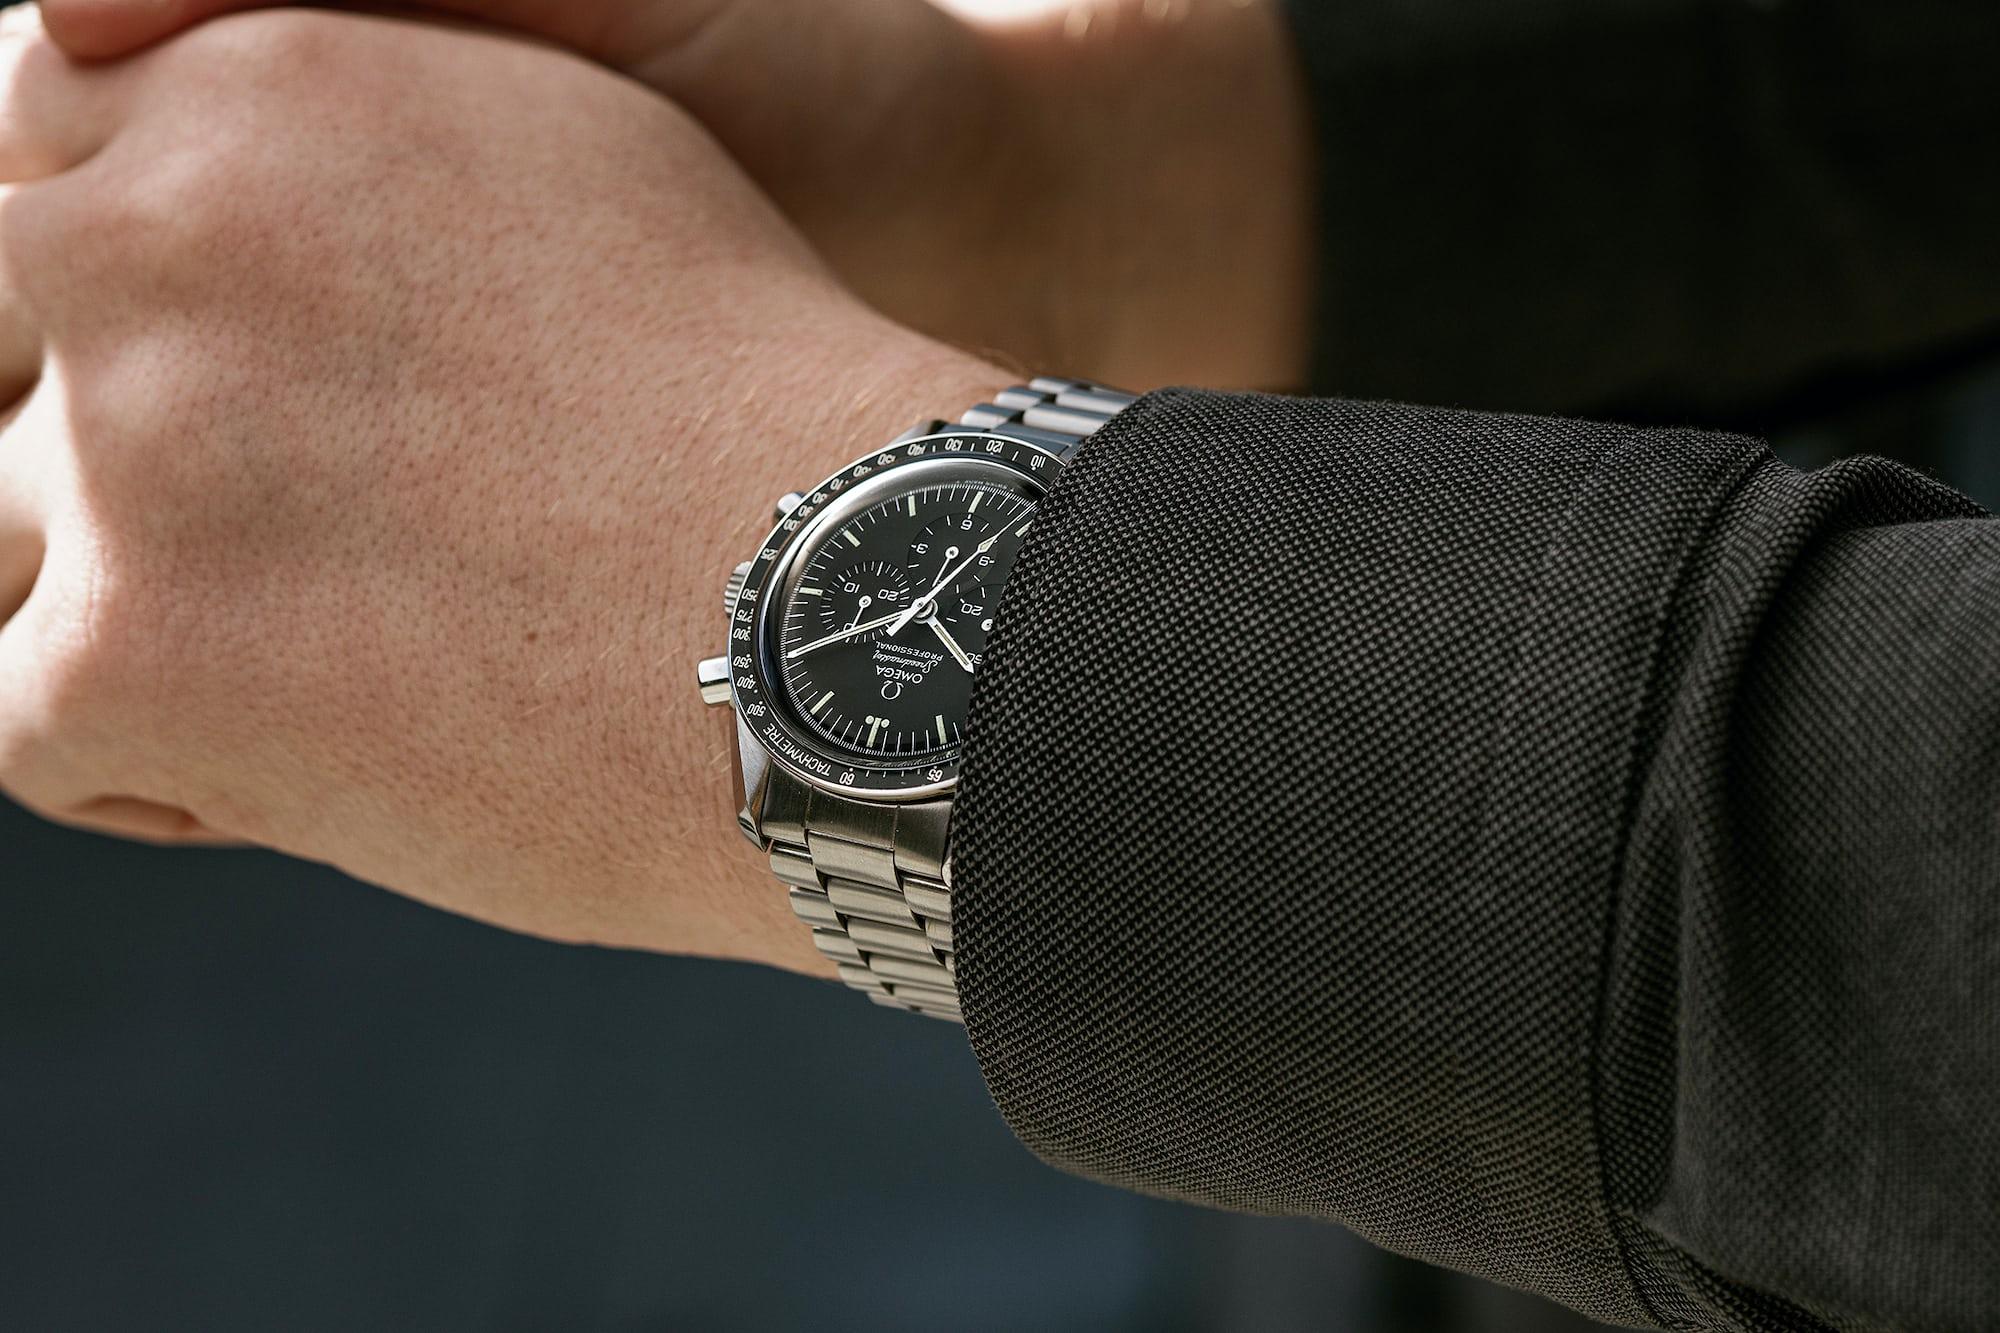 "<p><a href=""https://shop.hodinkee.com/products/speedmaster-ref-145-022-78-serial-44820671"" rel=""noopener"" target=""_blank""><u>1980s Omega Speedmaster Professional Ref. ST 145.022-78</u></a></p>"